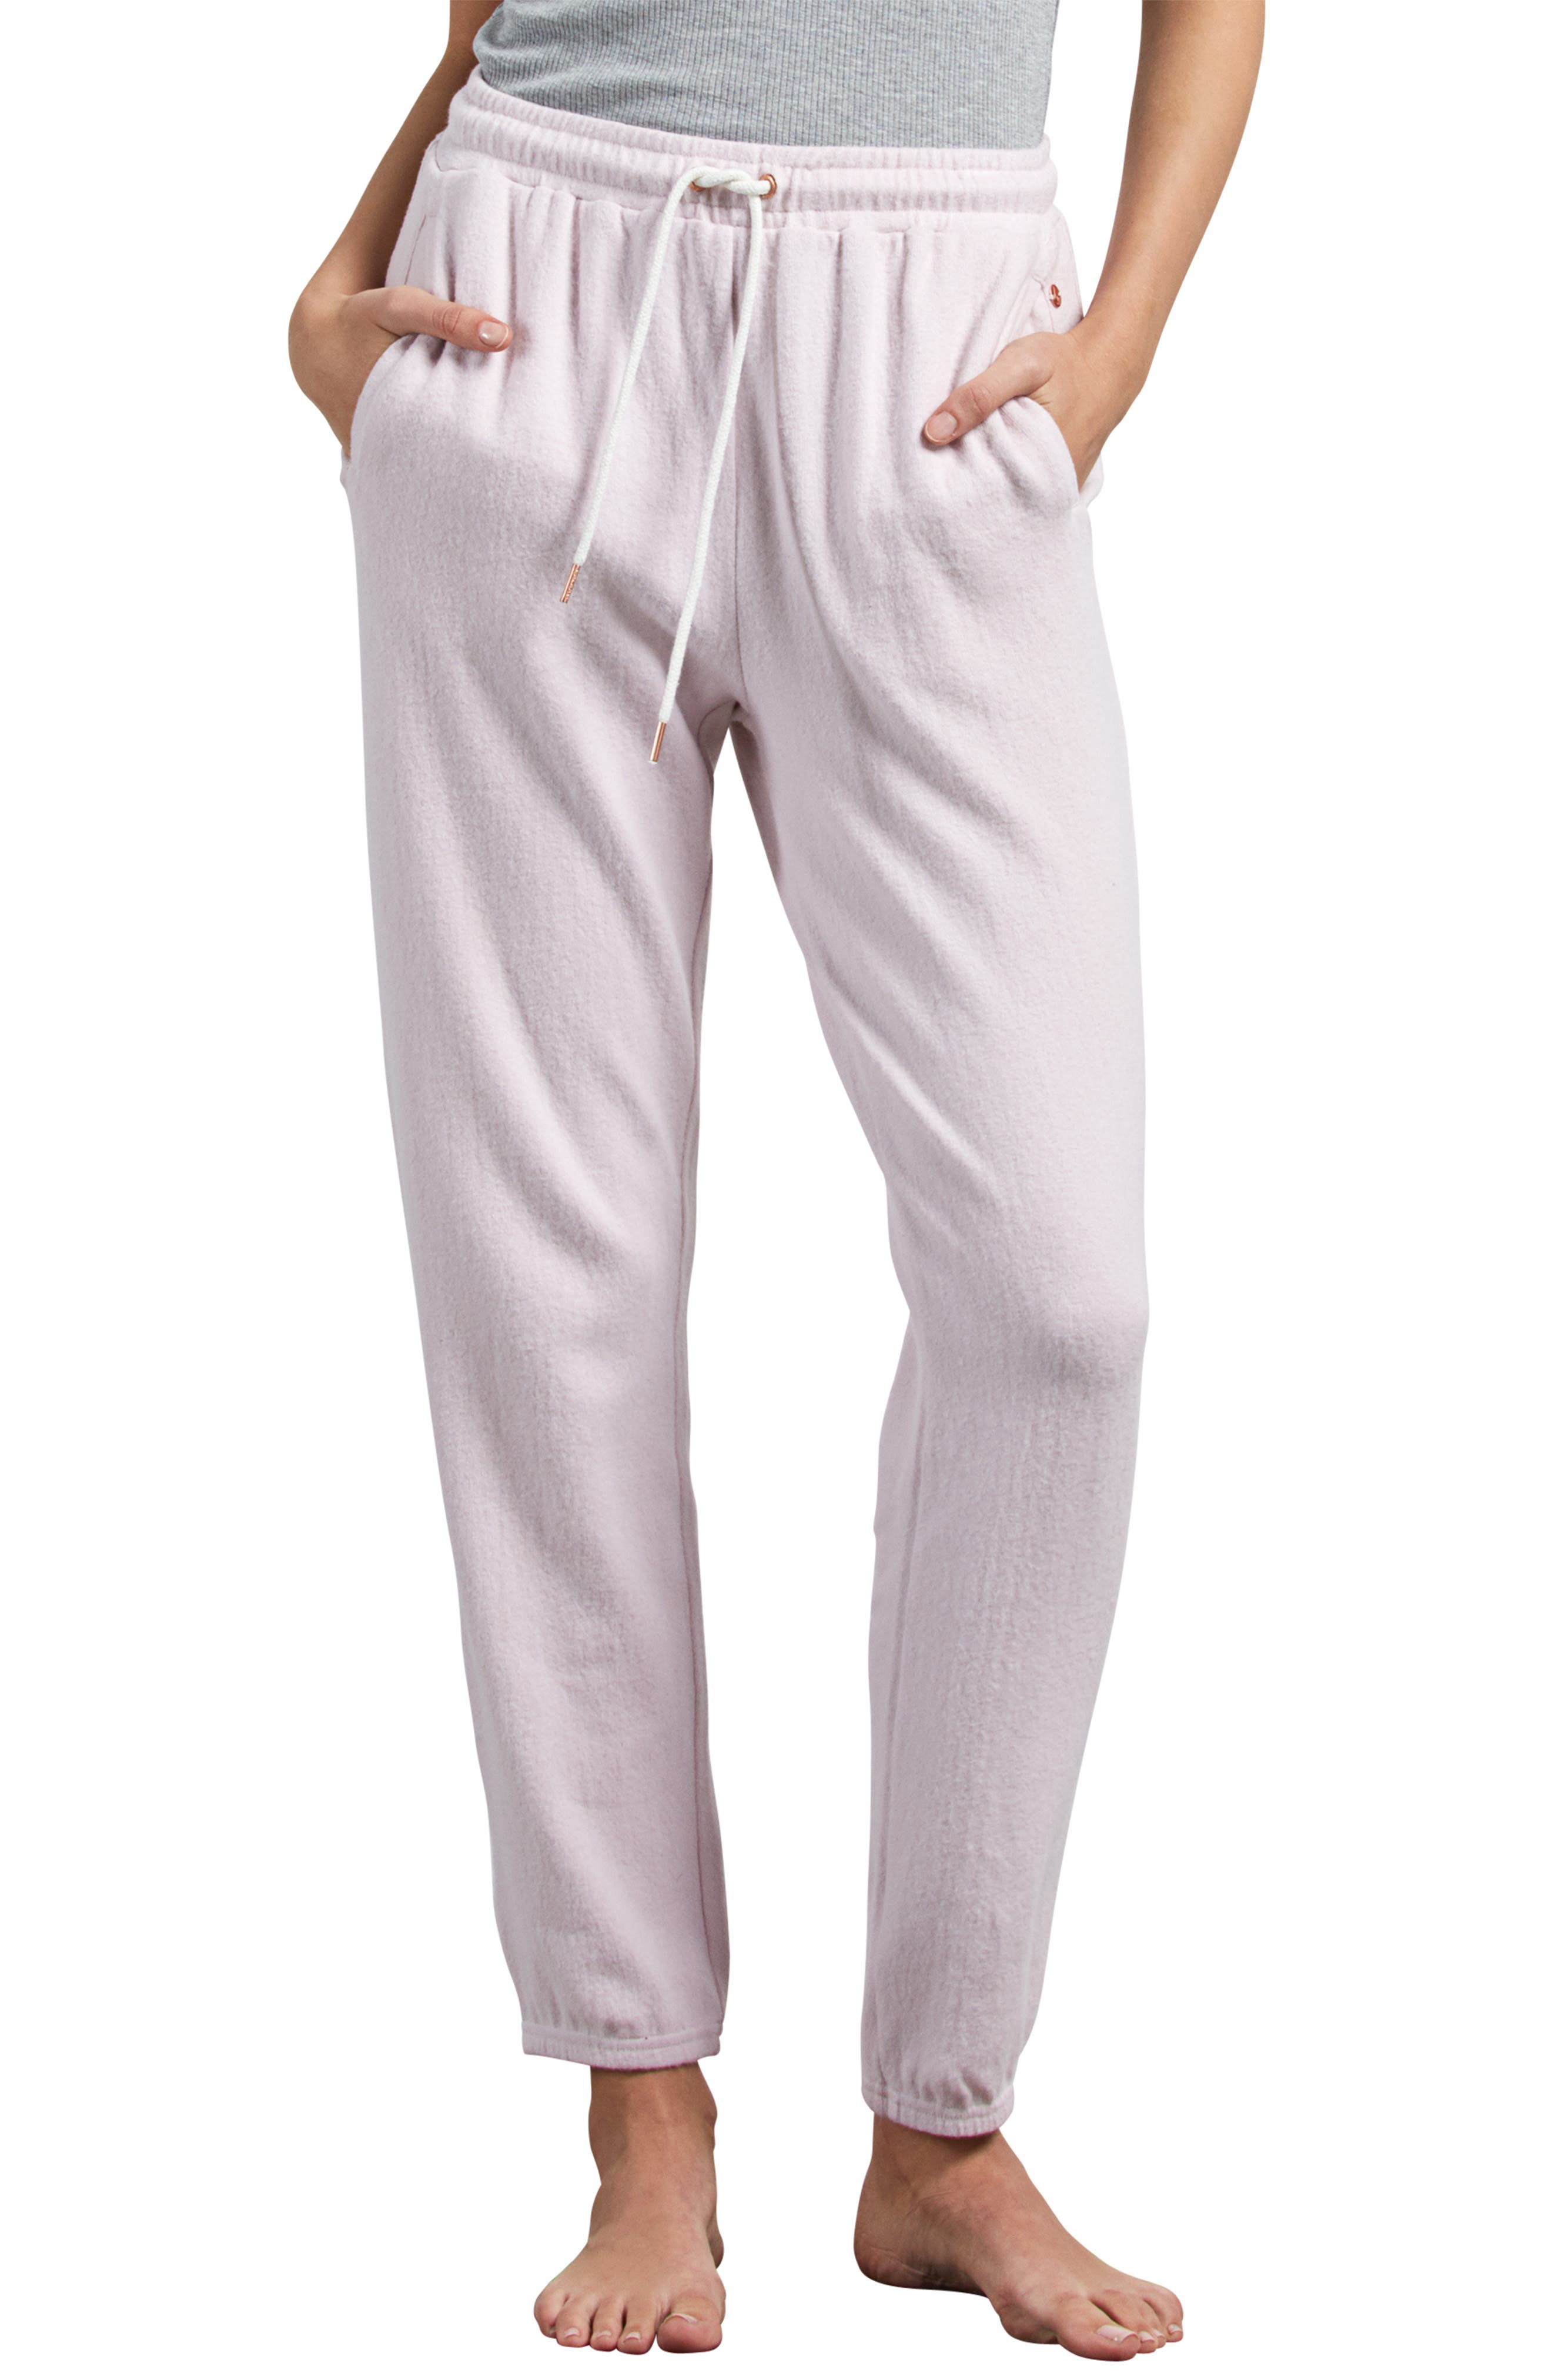 Lil Fleece Sweatpants,                             Main thumbnail 1, color,                             LIGHT PURPLE